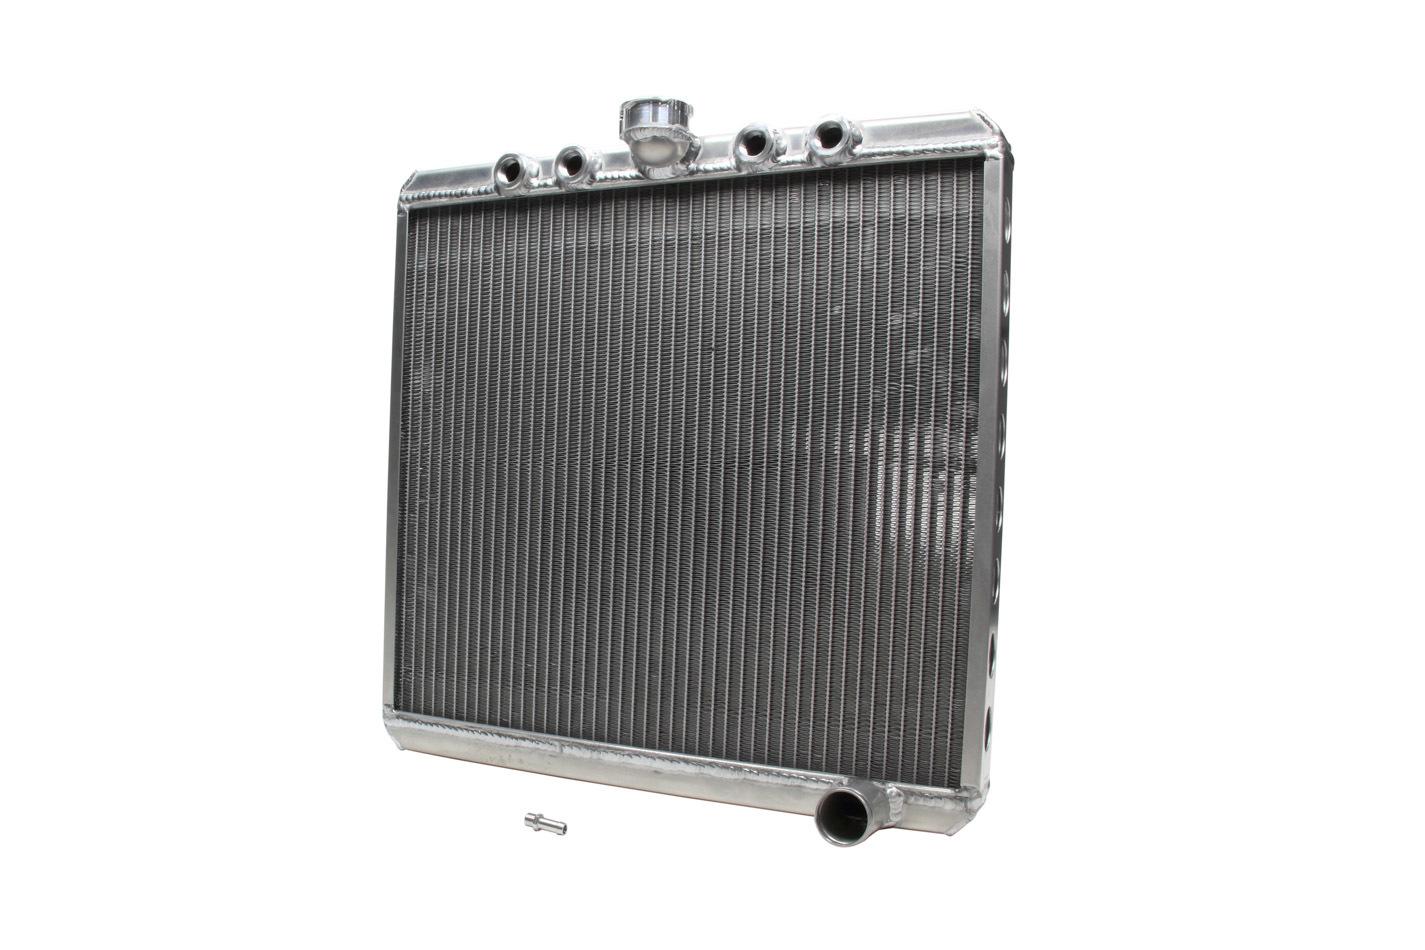 Saldana SRS2020 Radiator, Down Flow, 20 in W x 20 in H, Quad 10 AN Top Inlets, Passenger Side Outlet, Aluminum, Natural, Sprint Car, Kit